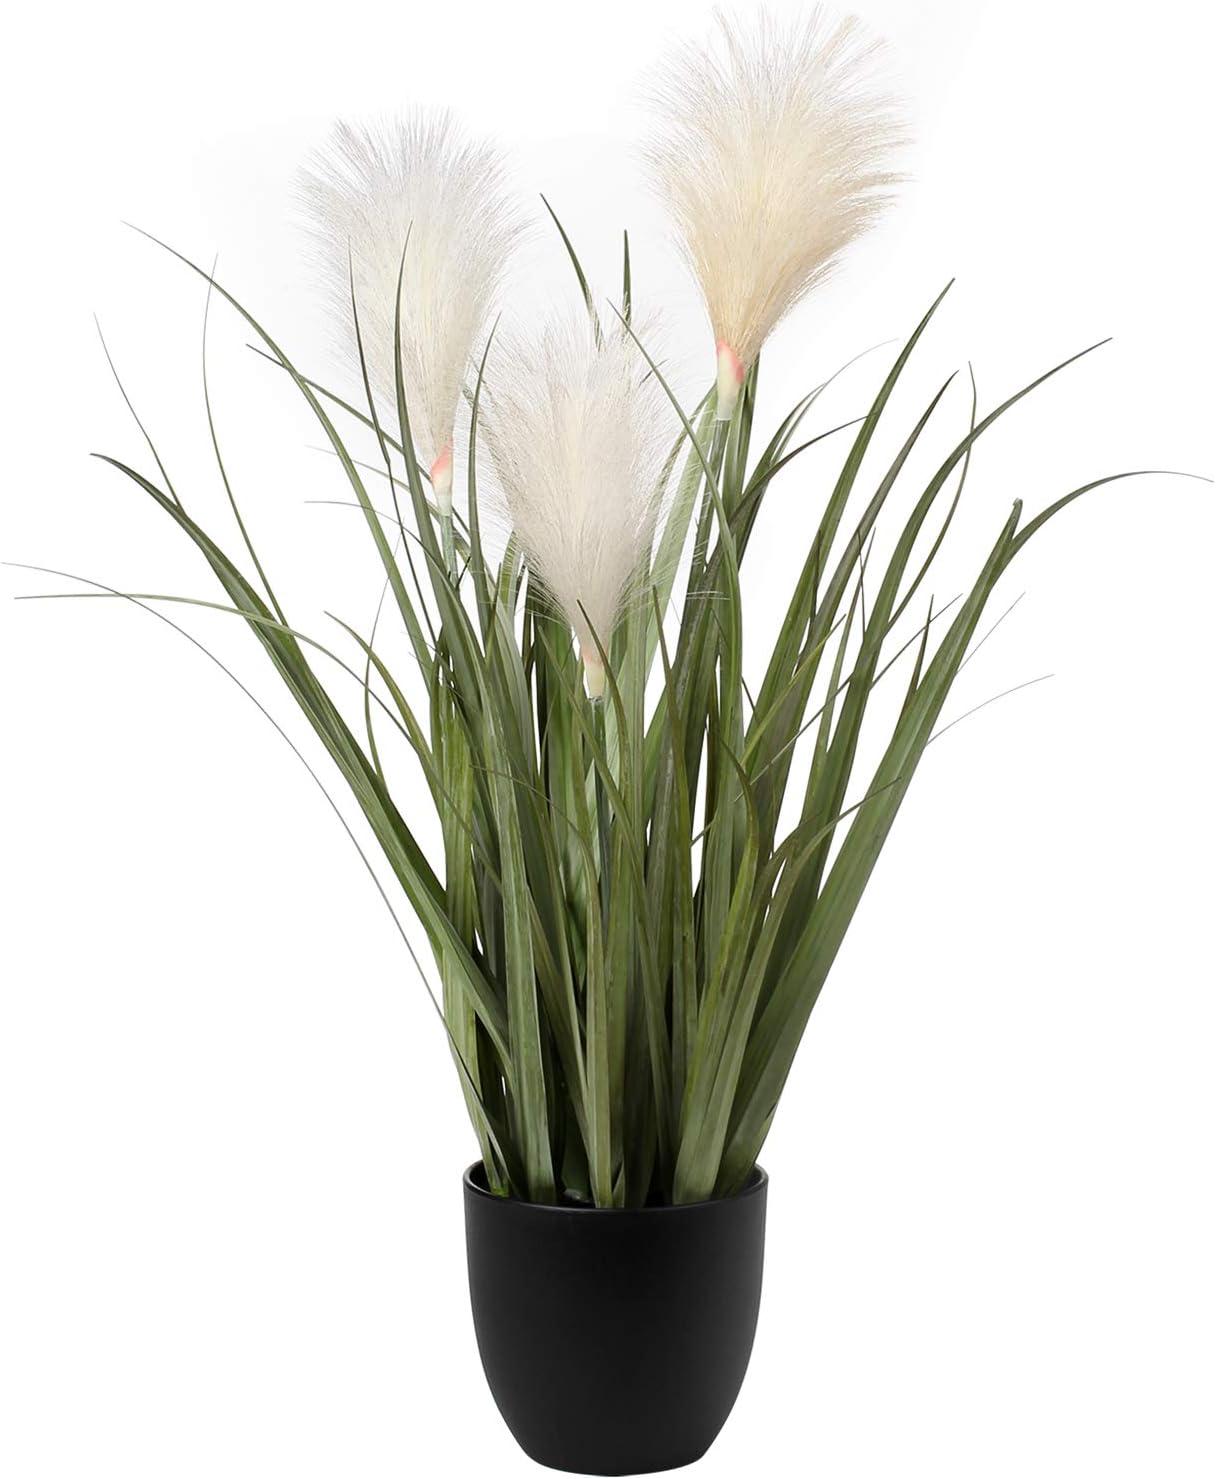 Fake Plants, Large Artificial Grass Plants 27